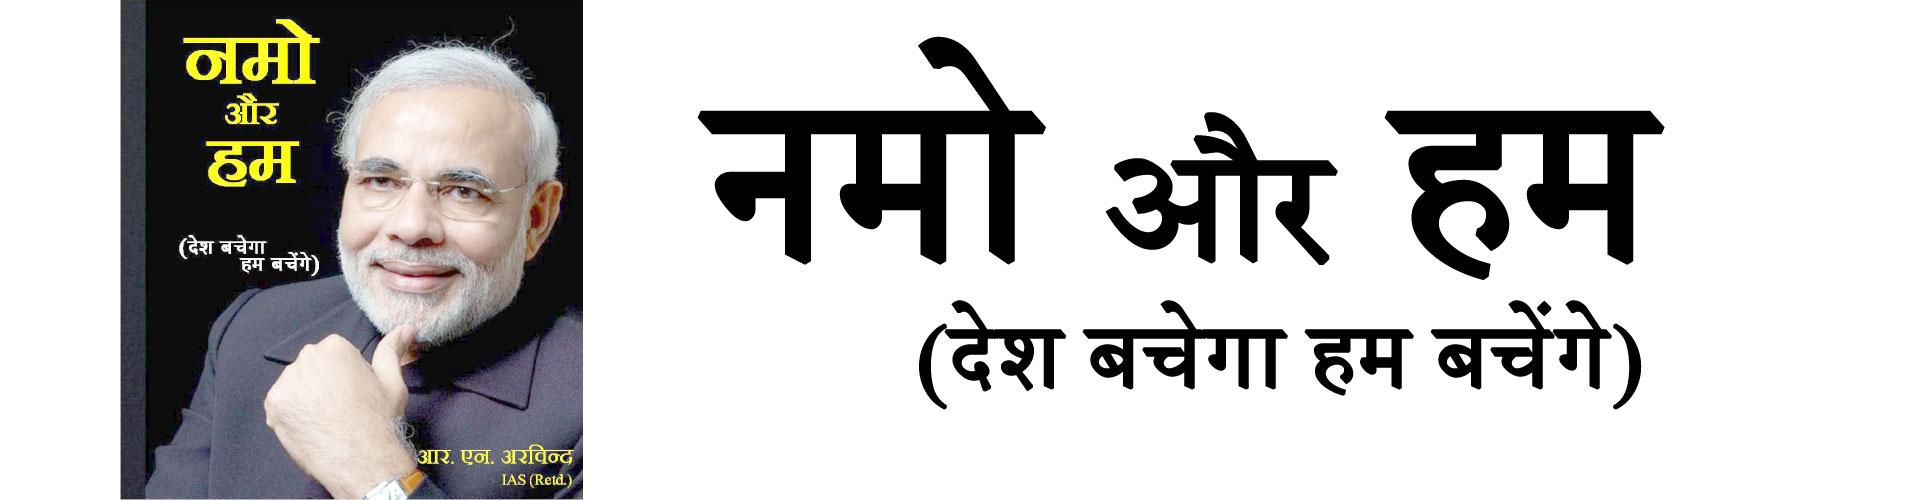 Namo Aur Hum – Desh Bachega Hum Bachenge